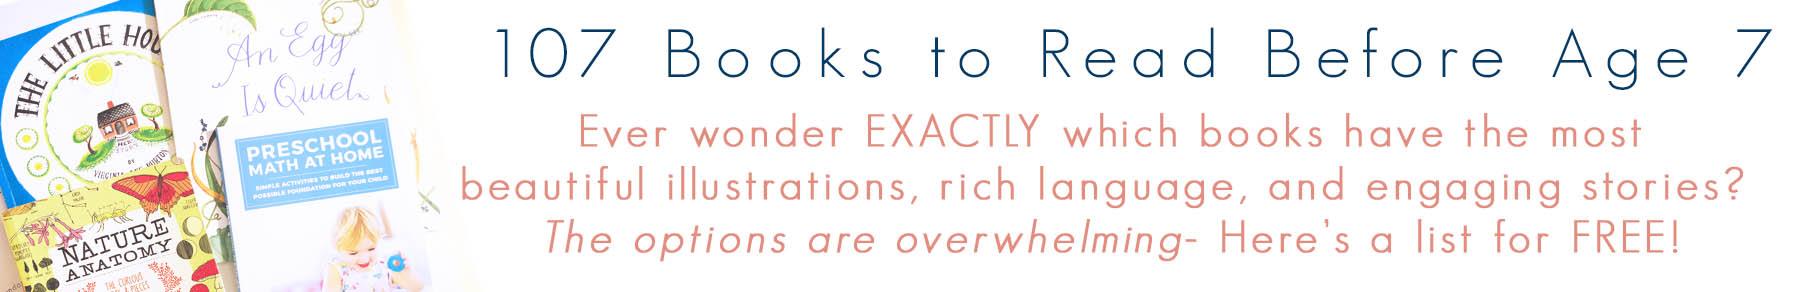 Free107Books.jpg